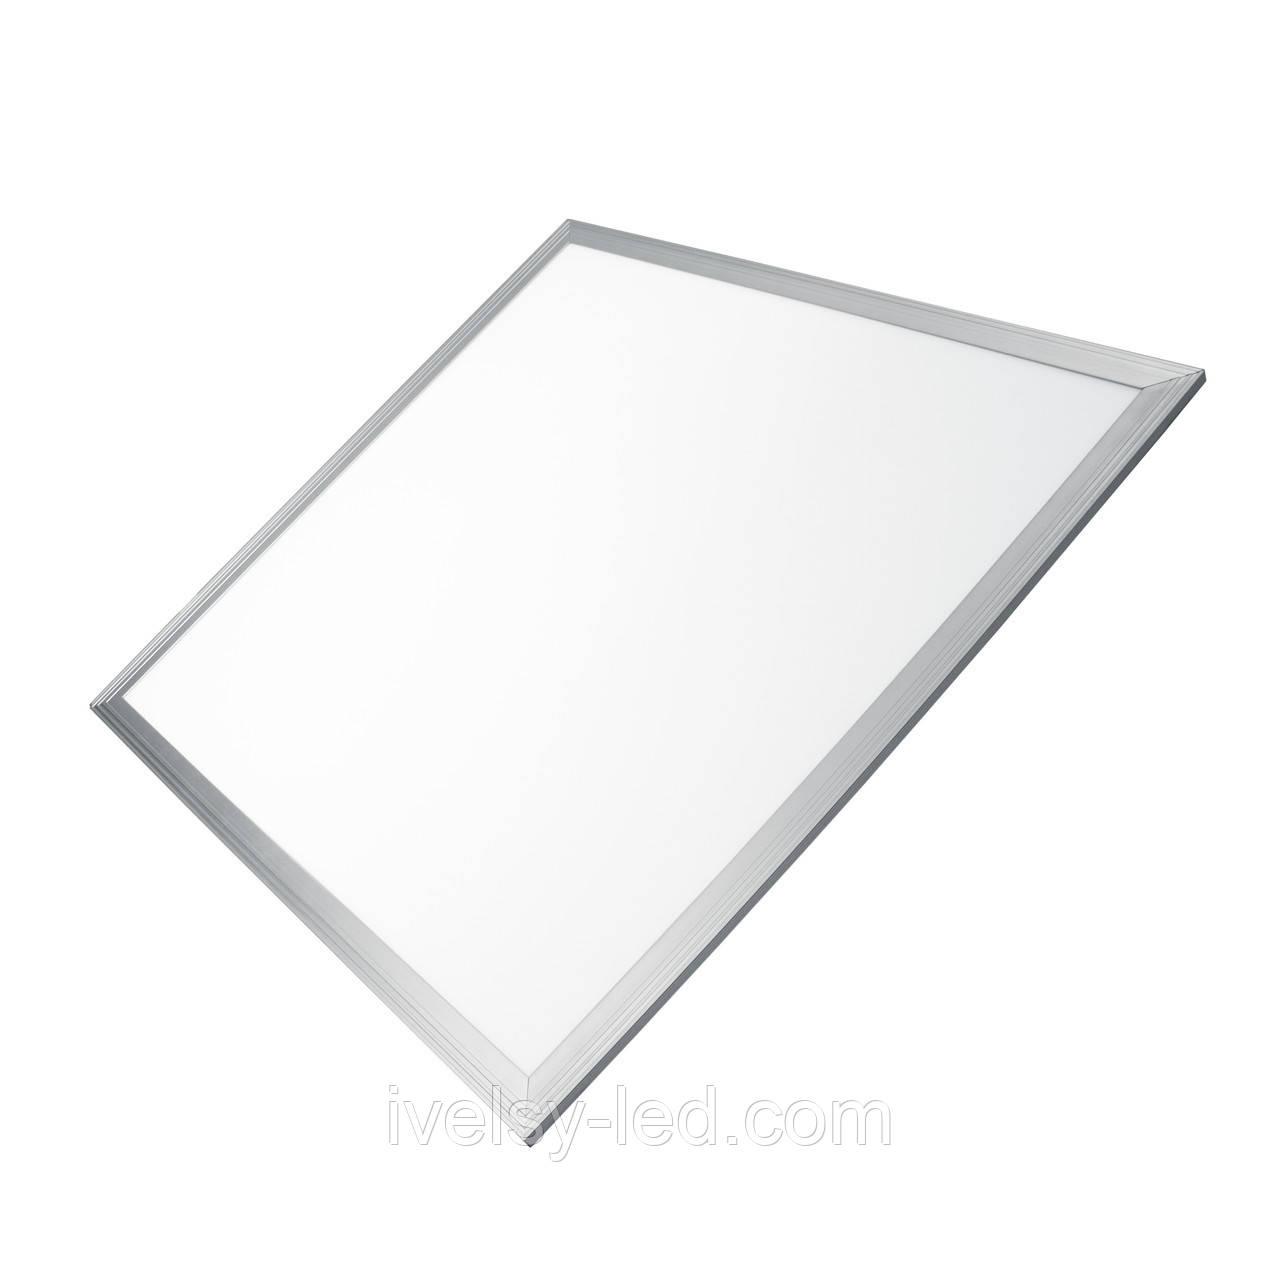 LED Светильник EUROLAMP 60х60 (панель) 36W 6500K